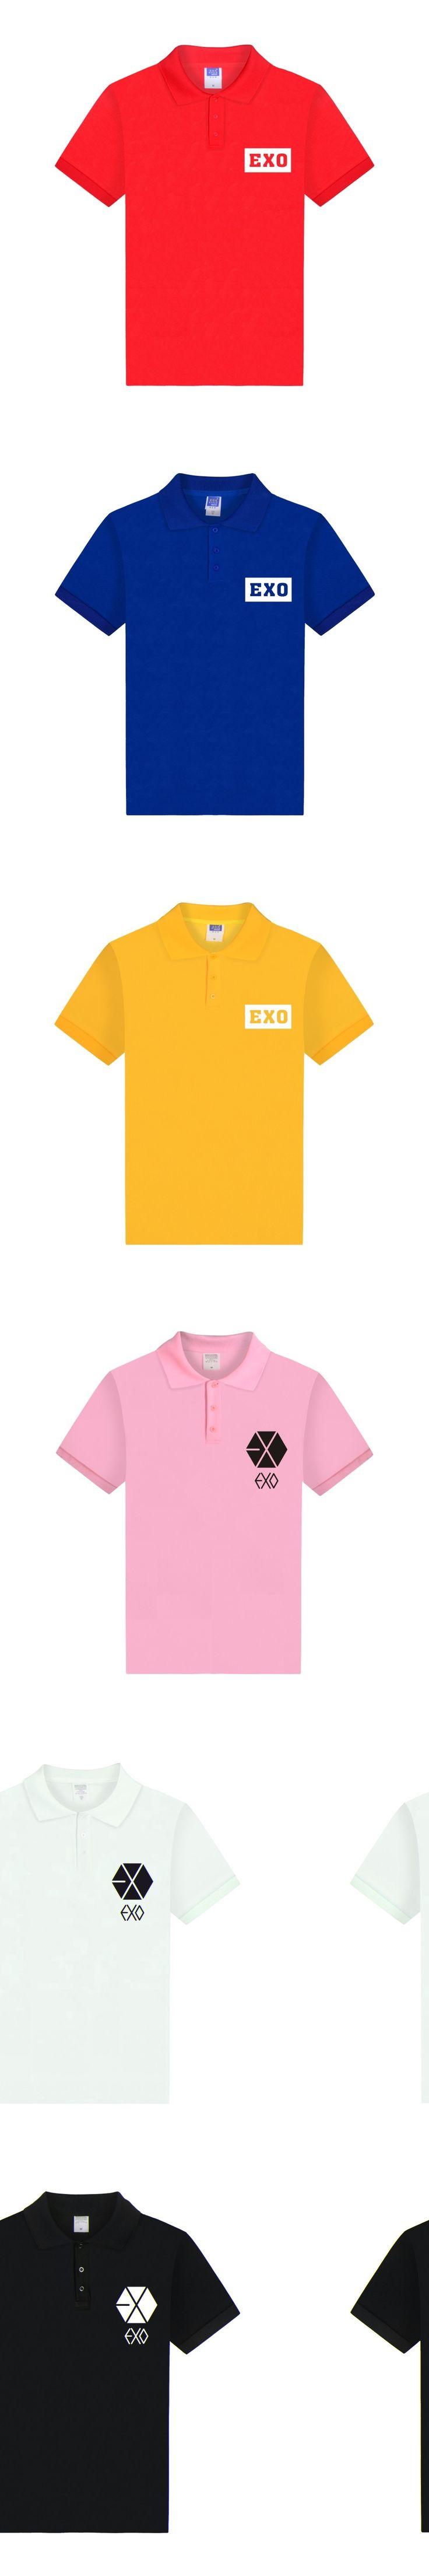 ALIZAZA 2017 Summer Kpop EXO Polo Shirt Men Short Sleeve Mens Polo Shirt Brands Short Sleeve Cotton Camisa Masculina